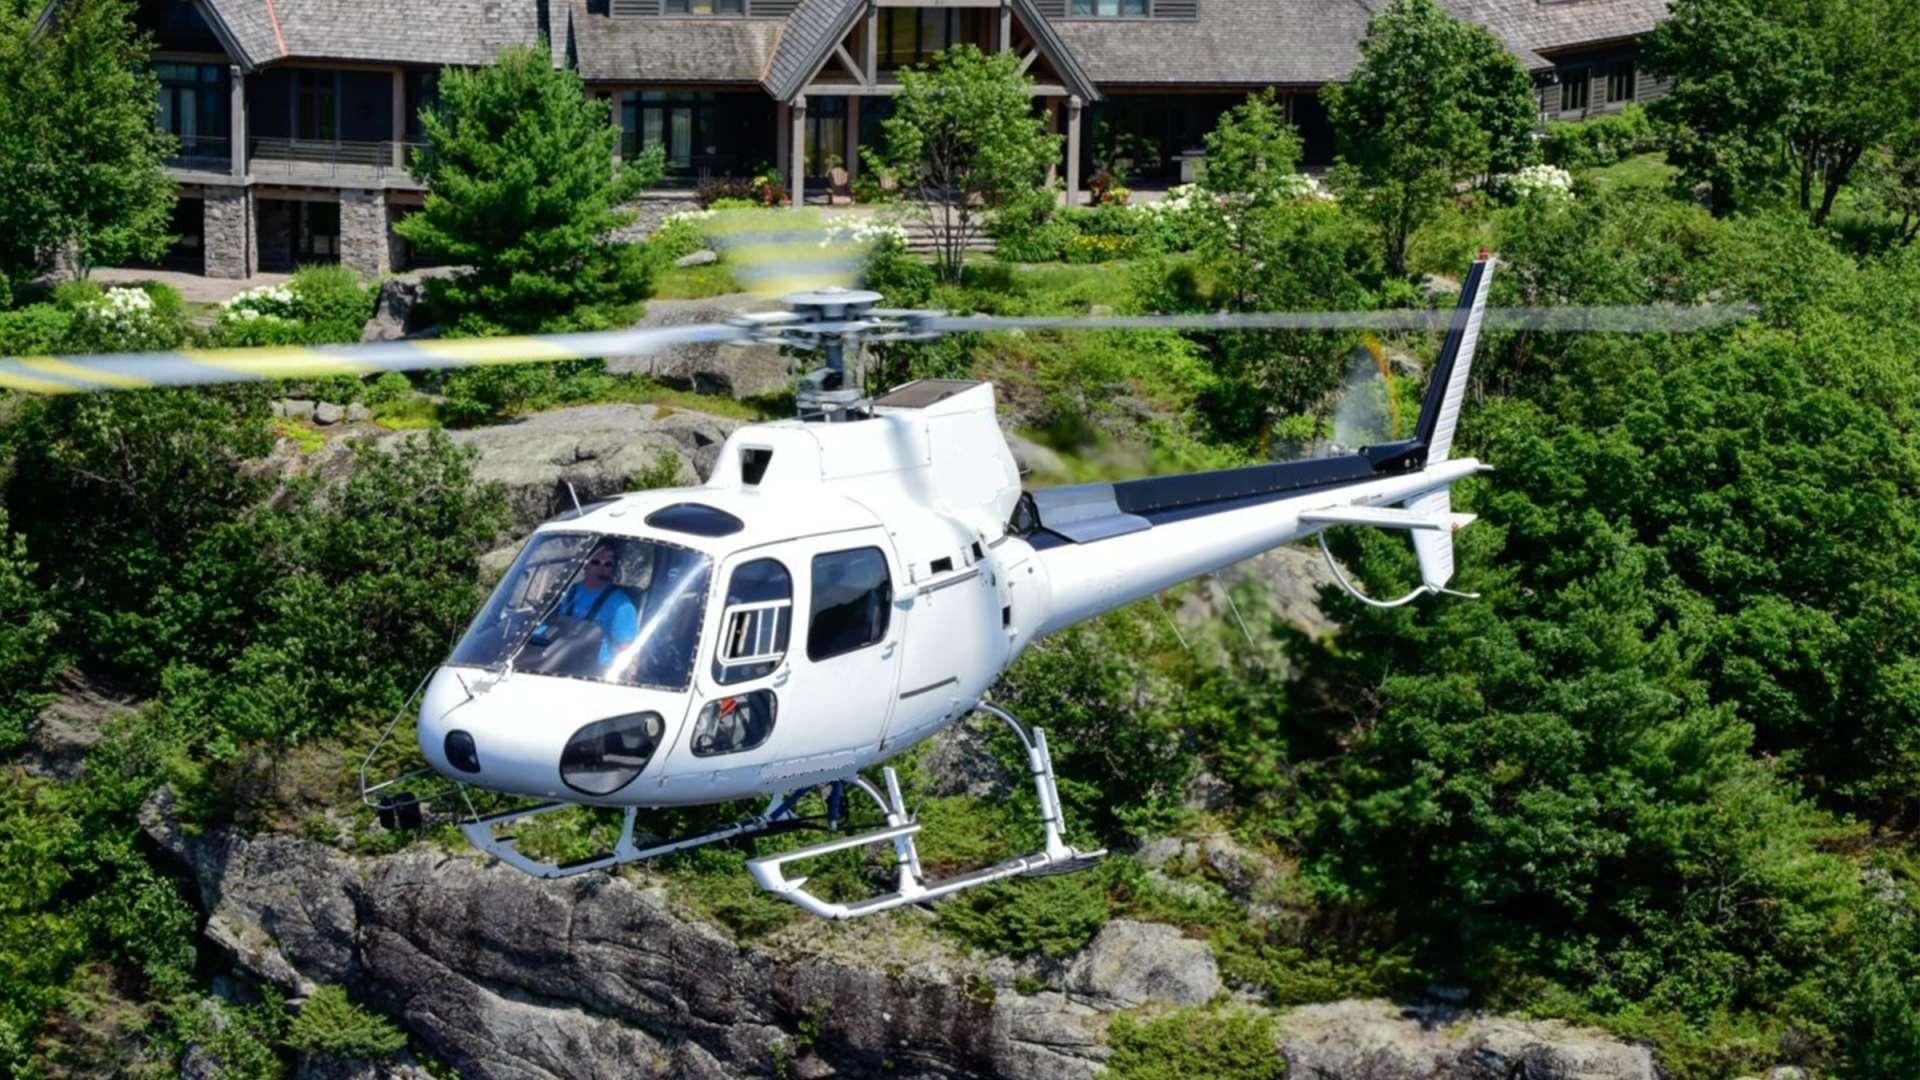 Helicopter Tours with Heli Muskoka